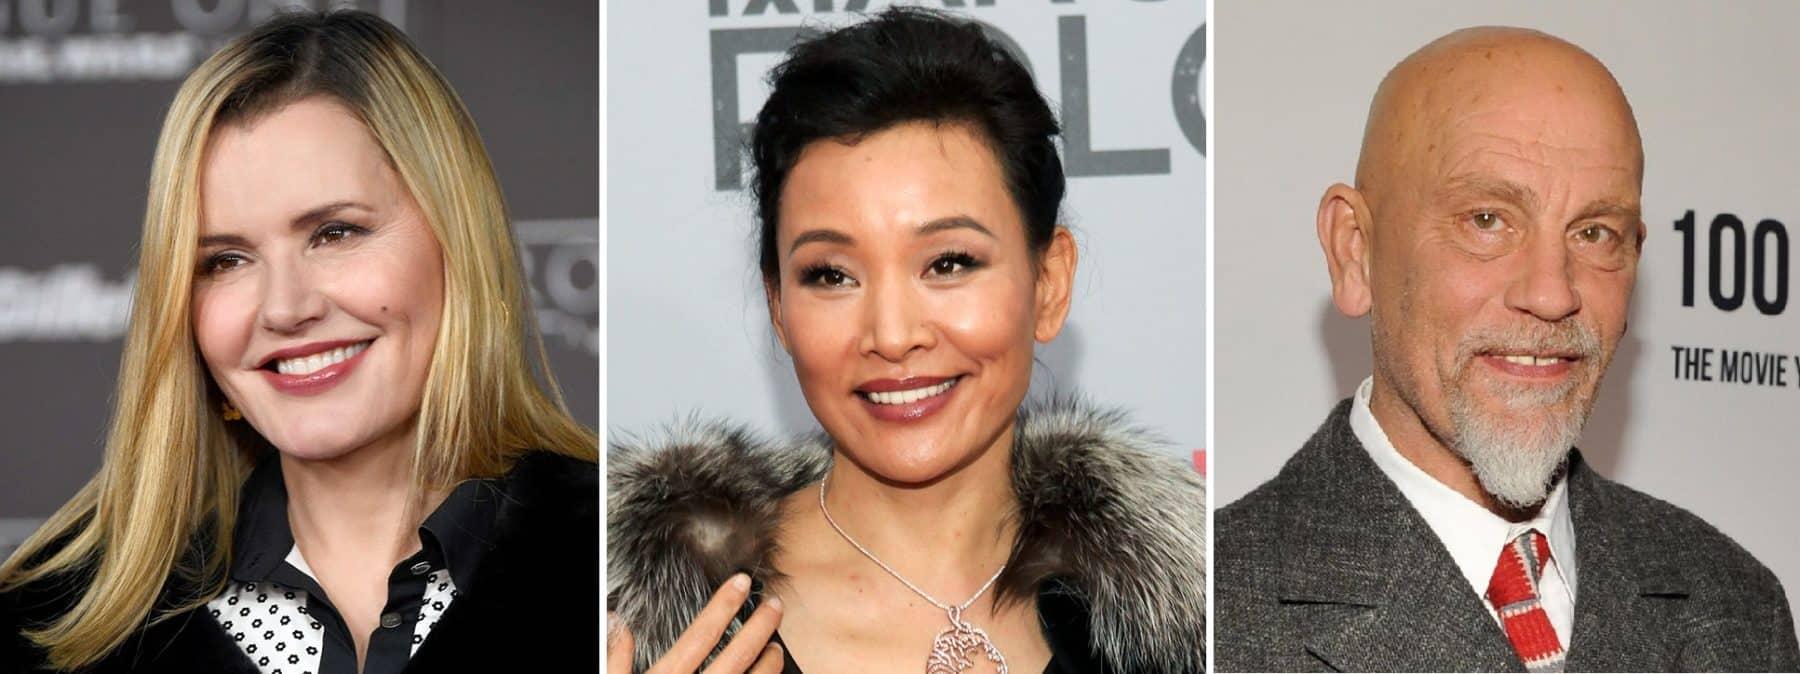 Geena Davis, Joan Cheng y John Malkovich se suman a Jessica Chastain en EVE de Voltage Pictures